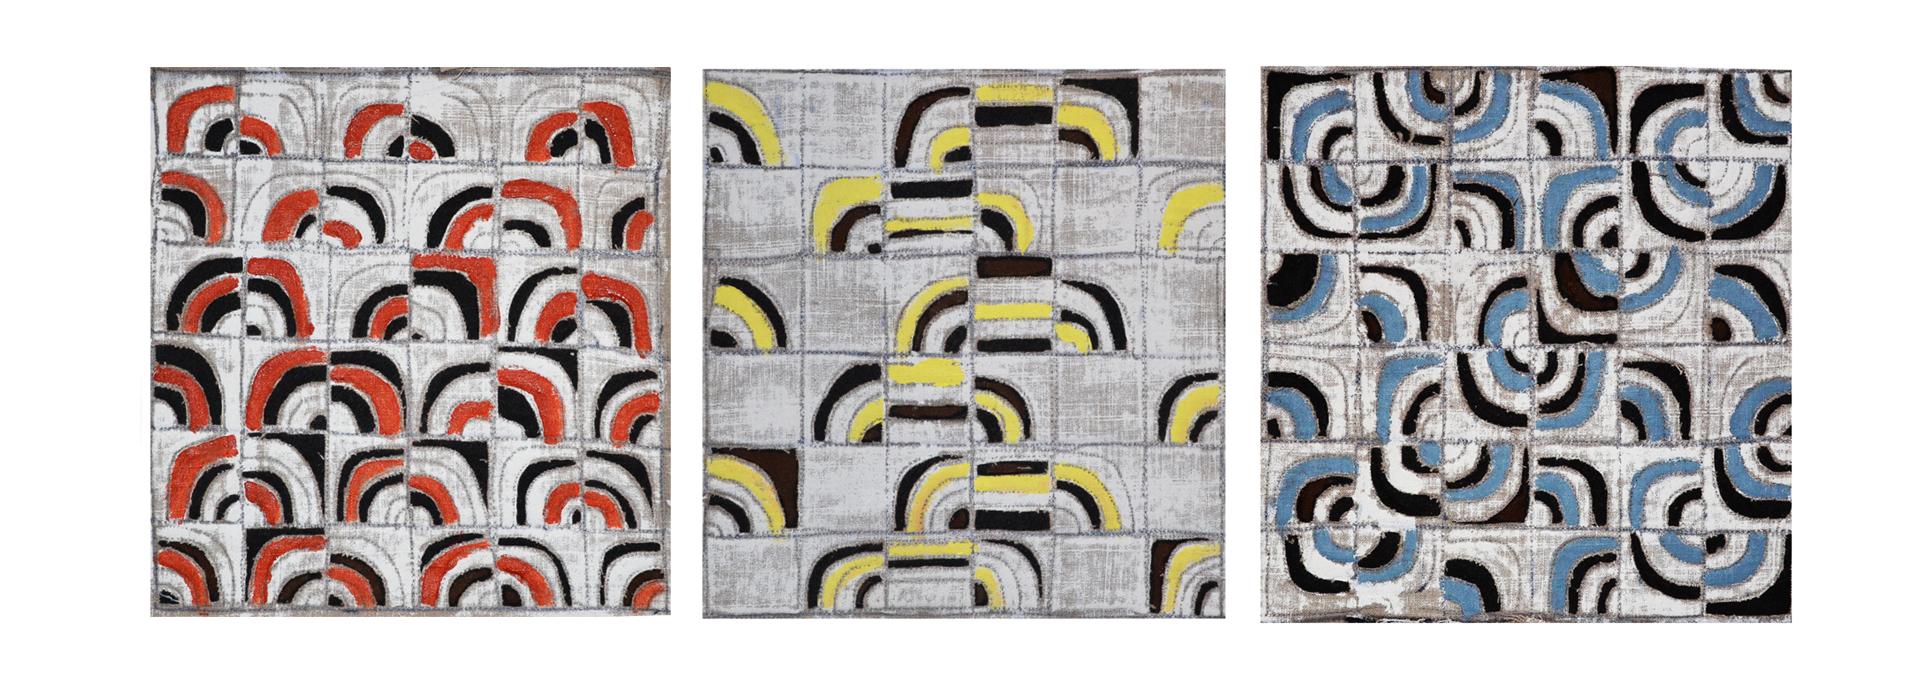 "Willis, Joshua R., ""Quarter Turns,"" Primed Raw Linen, Acrylic, Cotton, 12"" x 36"",2016"